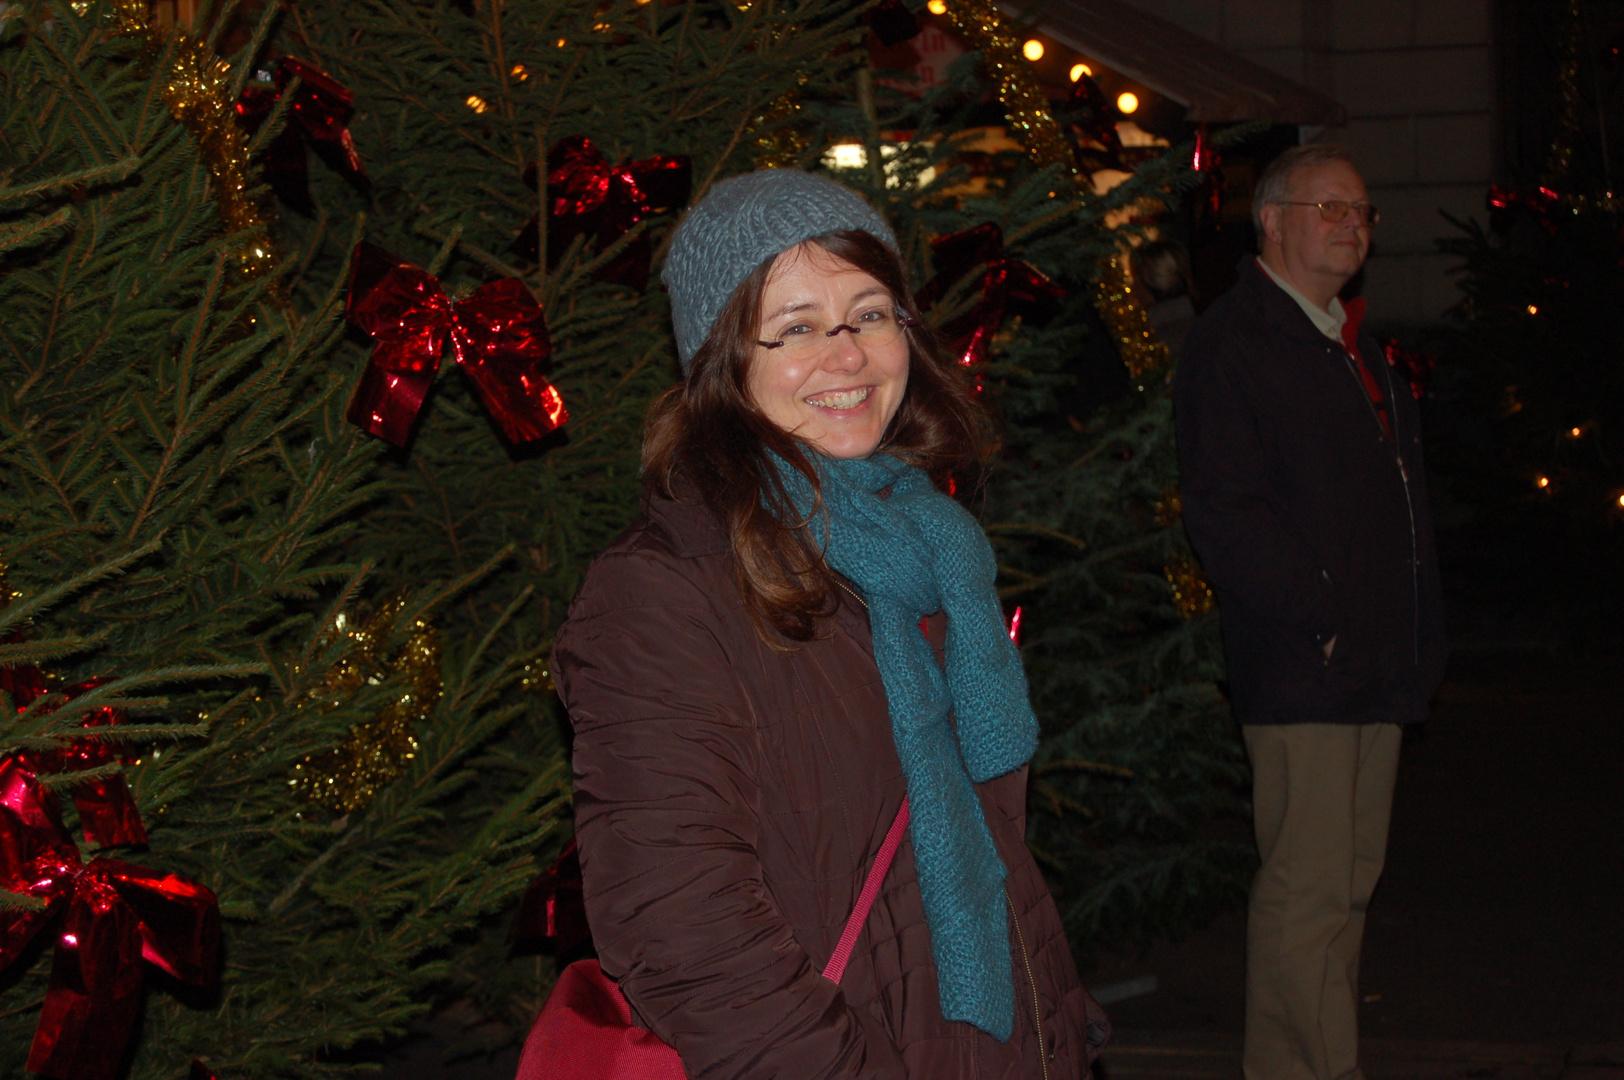 On the Christmasmarket